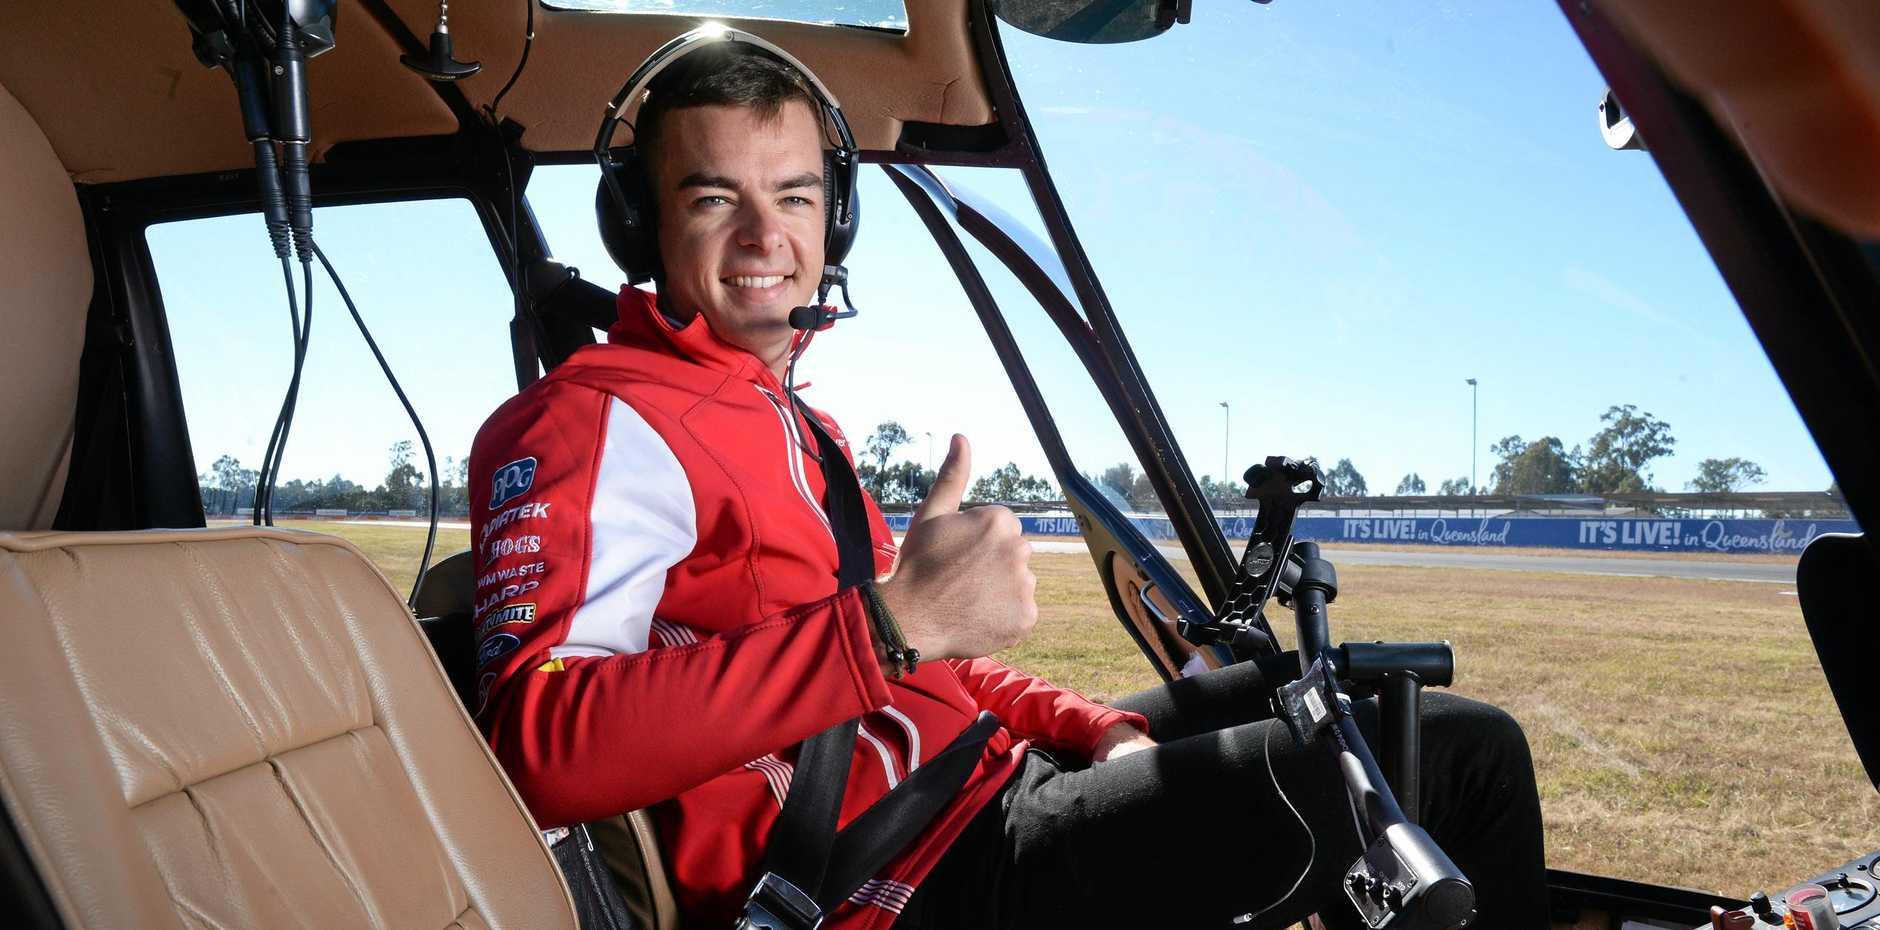 Shell V-Power Scott McLaughlin in a chopper at Queensland Raceway on Tuesday.